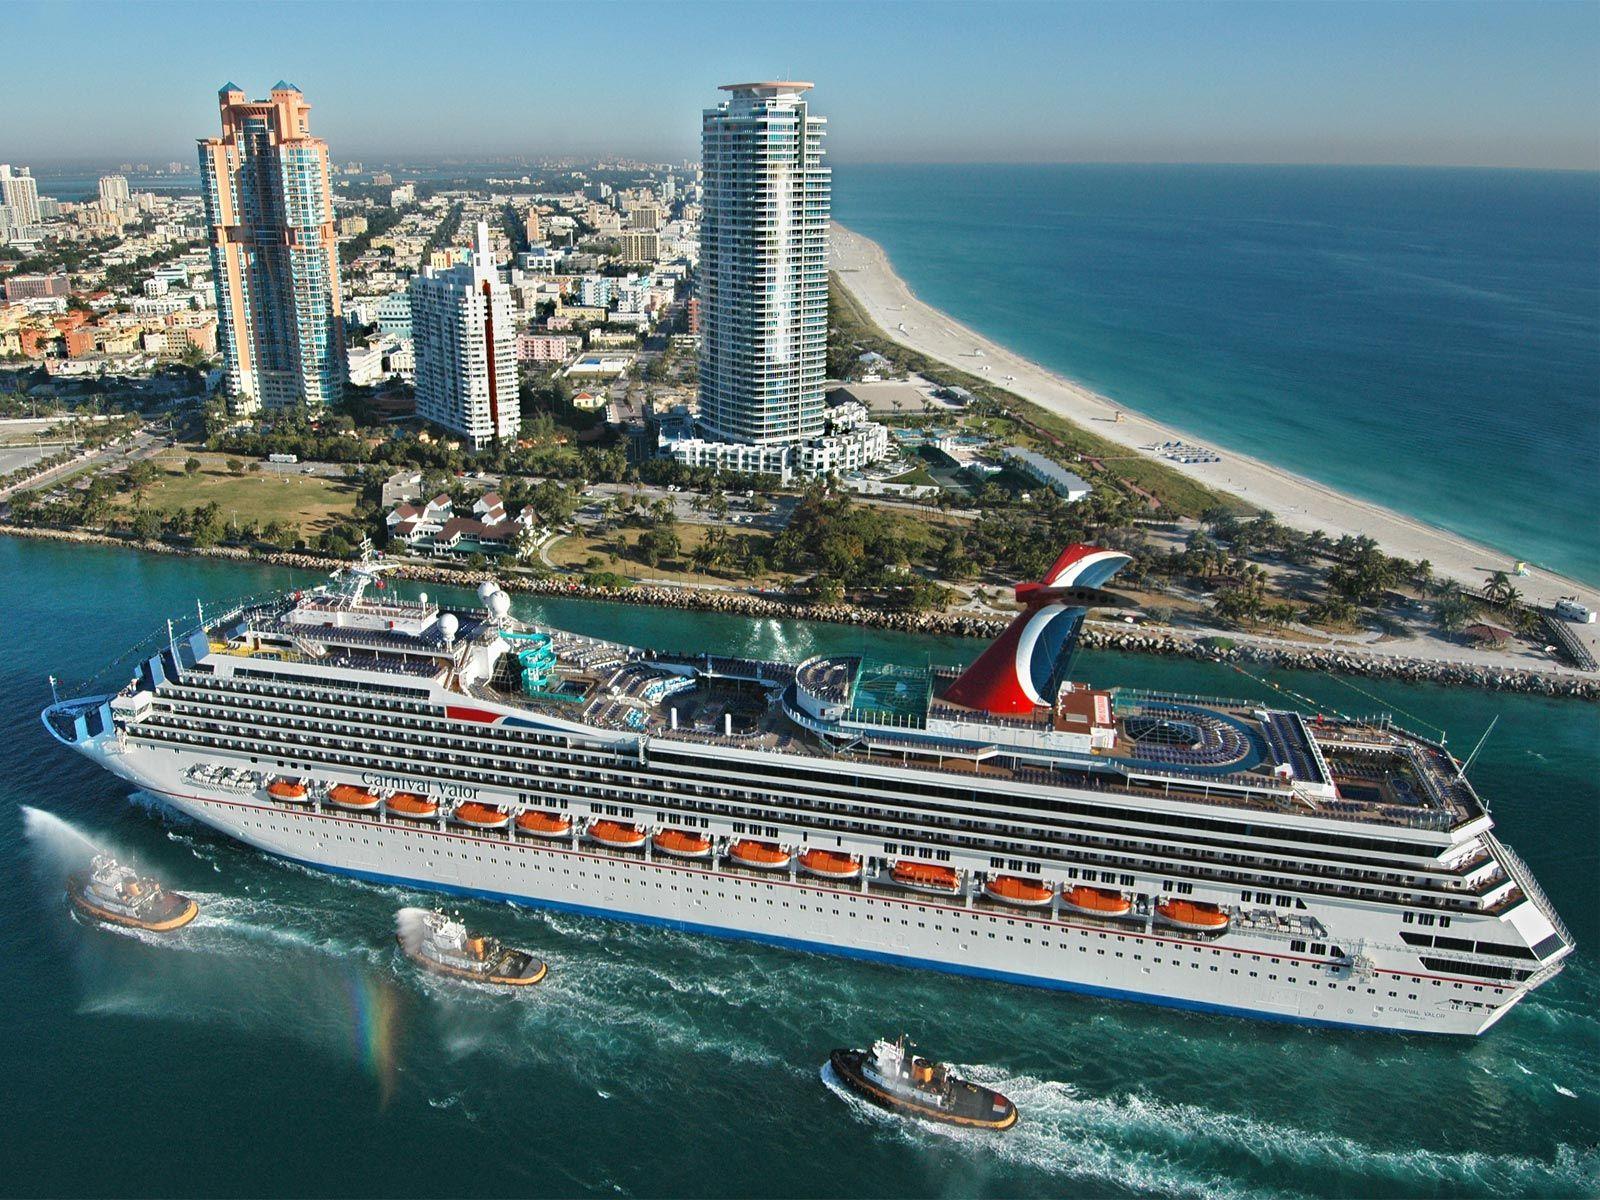 Carnivalvalorcruiseshippassesmiamibeachfreewallpaper The - Best cruises from florida